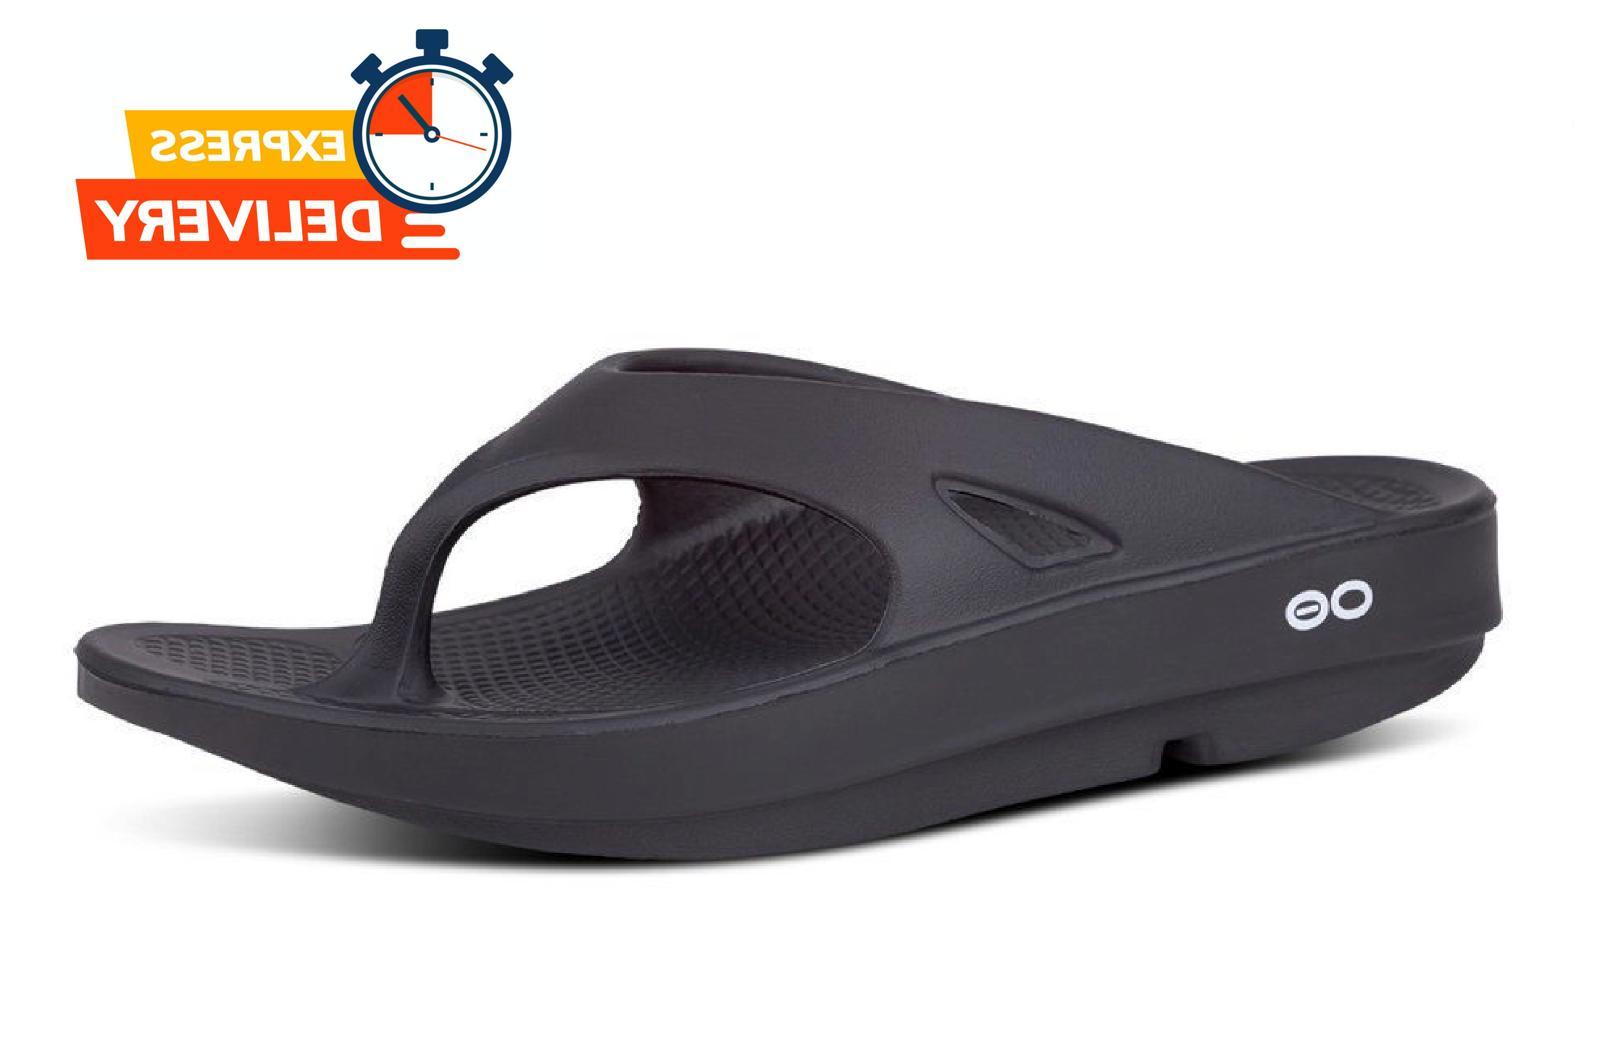 original sandals flip flop recovery thong footwear